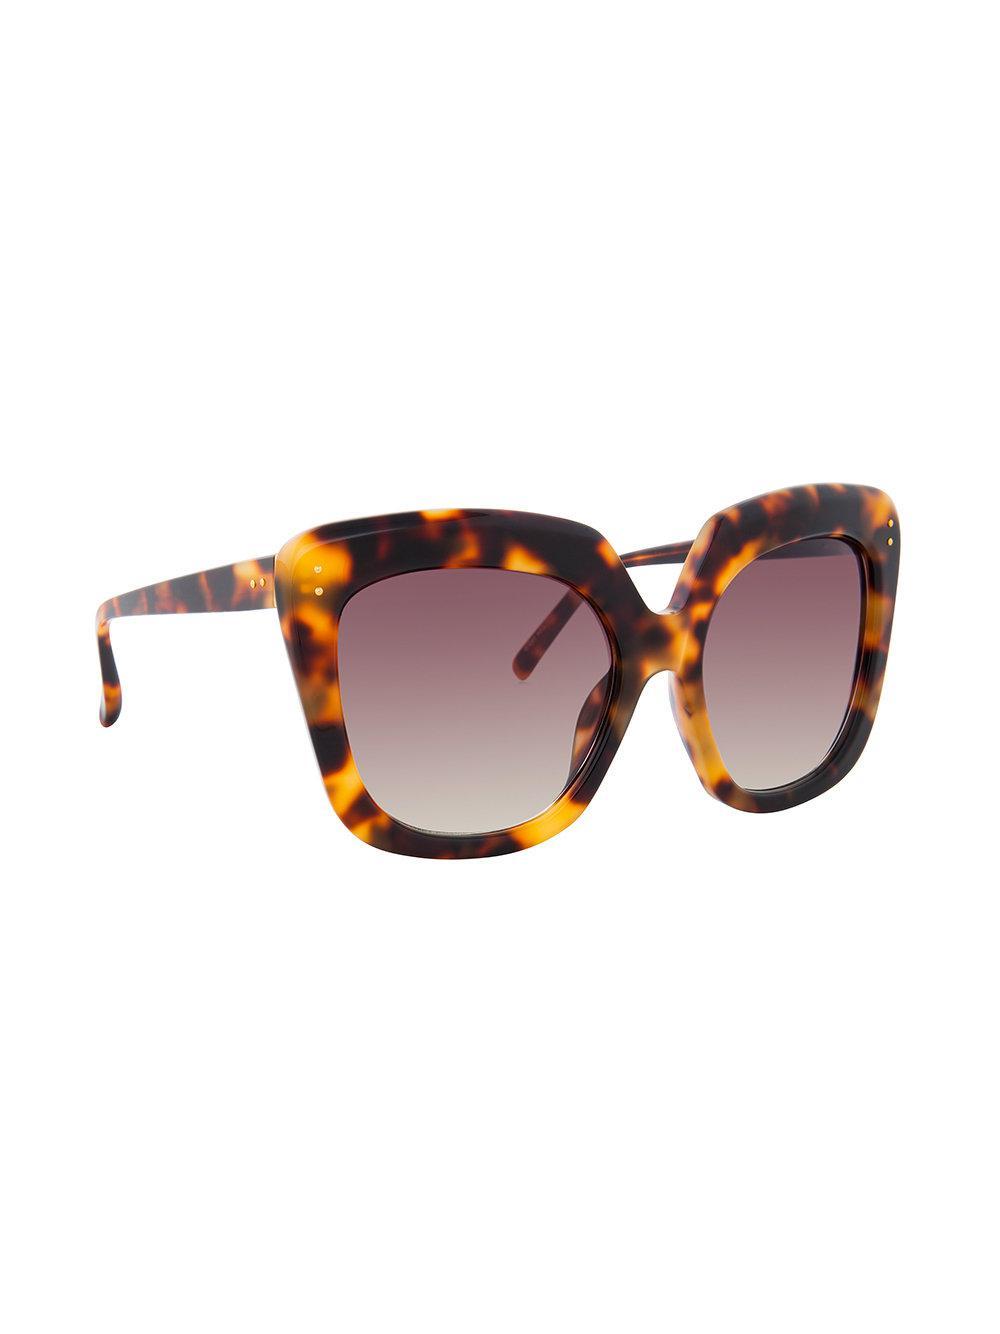 589ad9545f Lyst - Linda Farrow 556 C3 Oversized Sunglasses in Brown